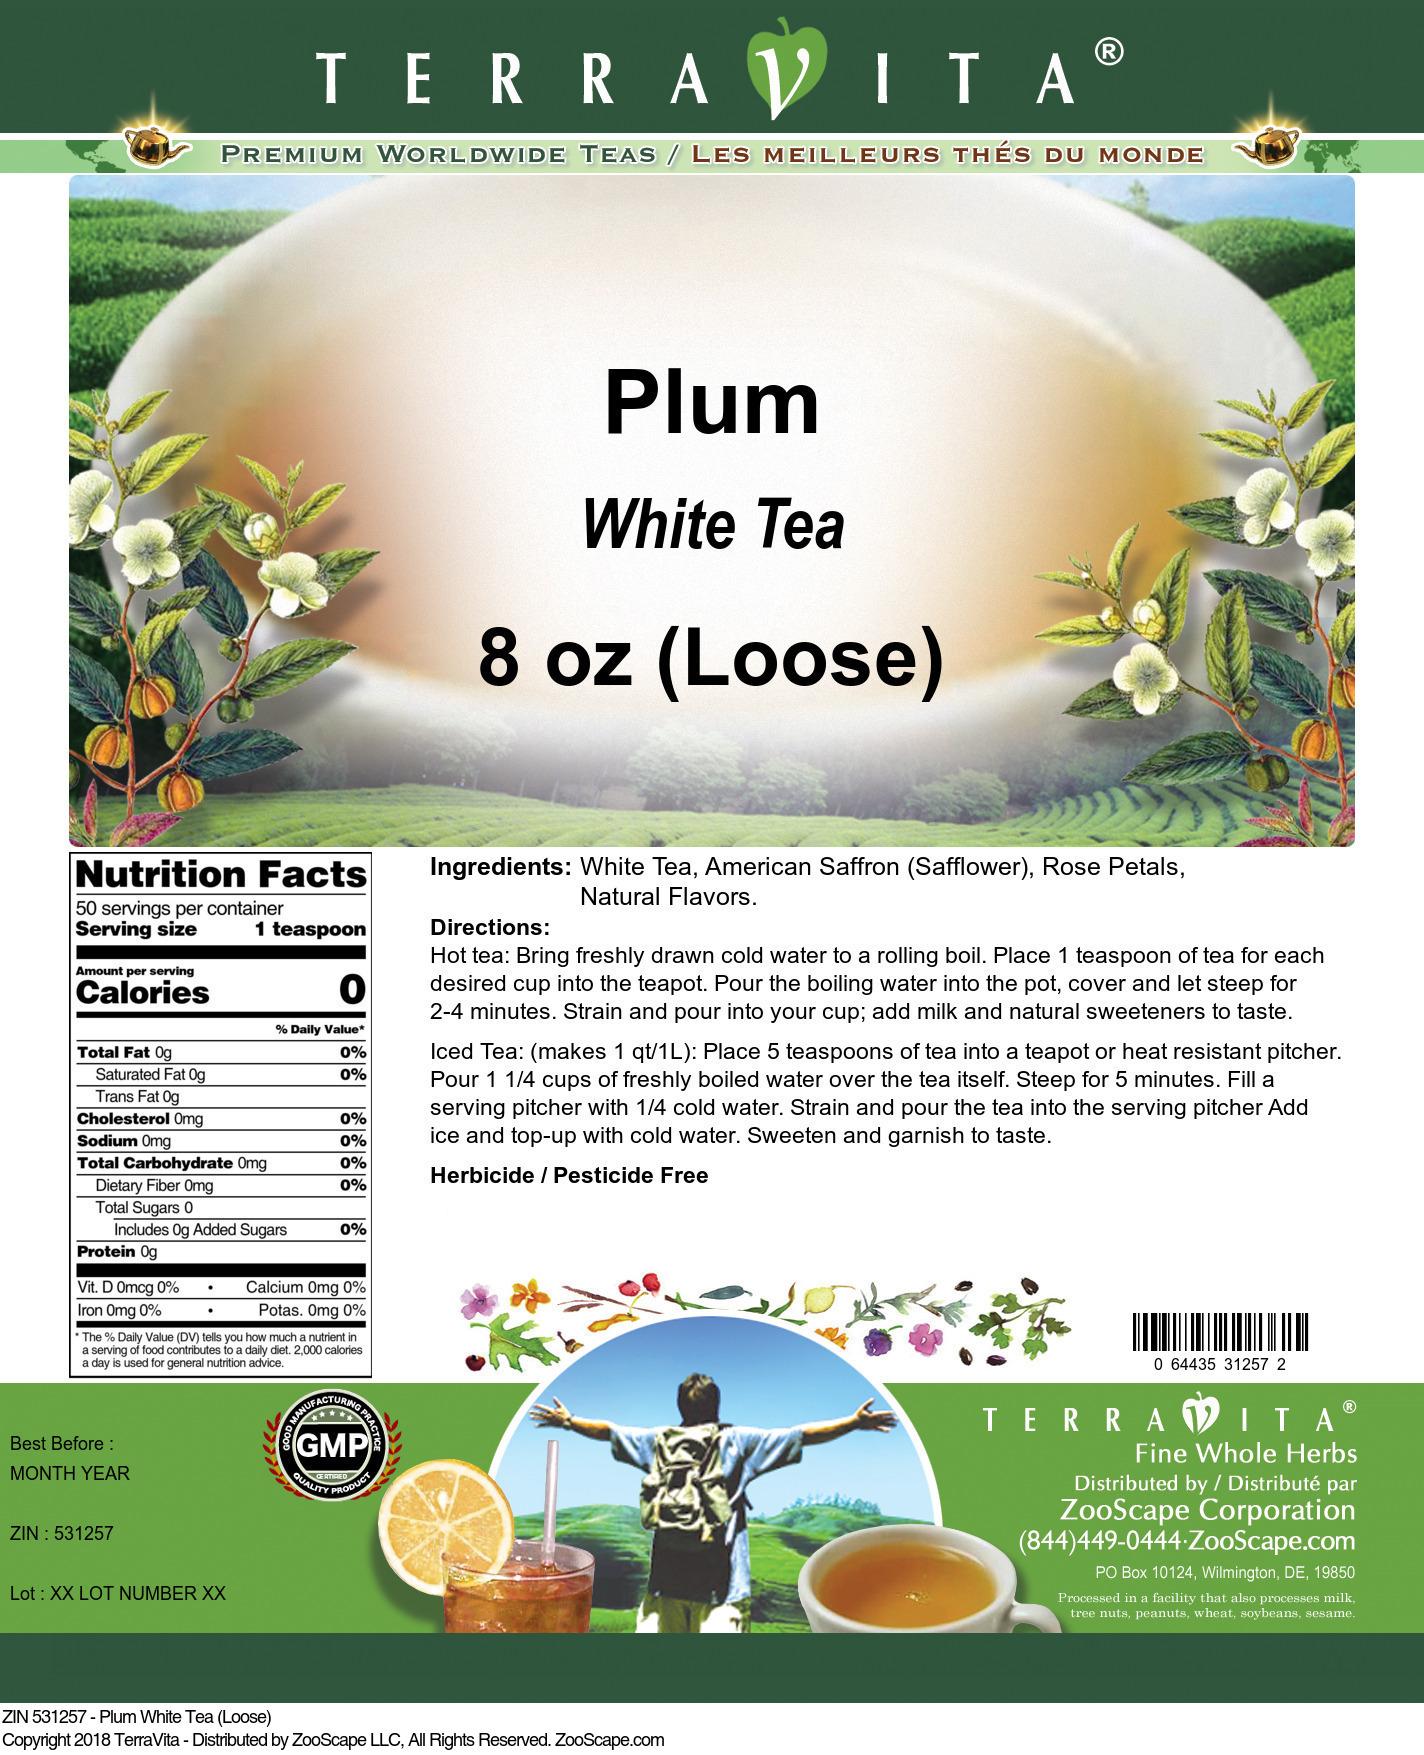 Plum White Tea (Loose)